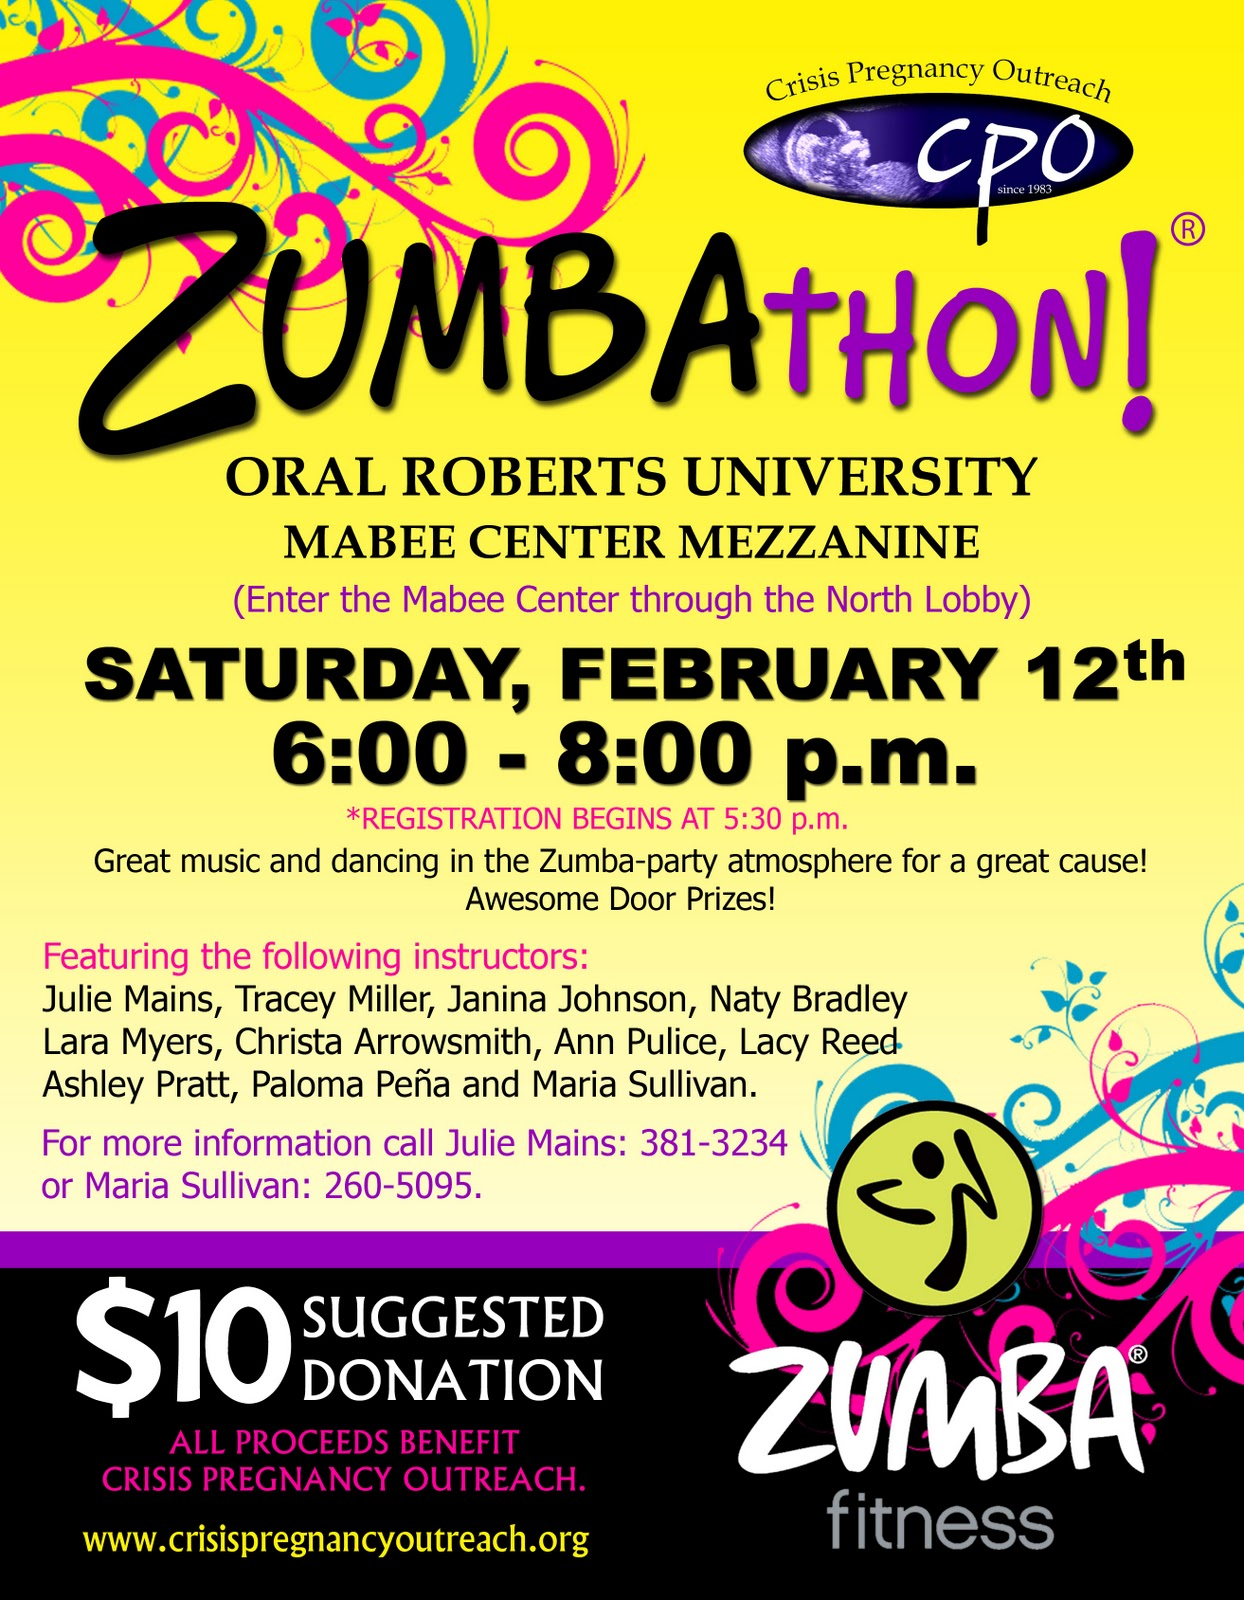 Crisis Pregnancy Center Zumbathon February 12Zumbathon Flyer